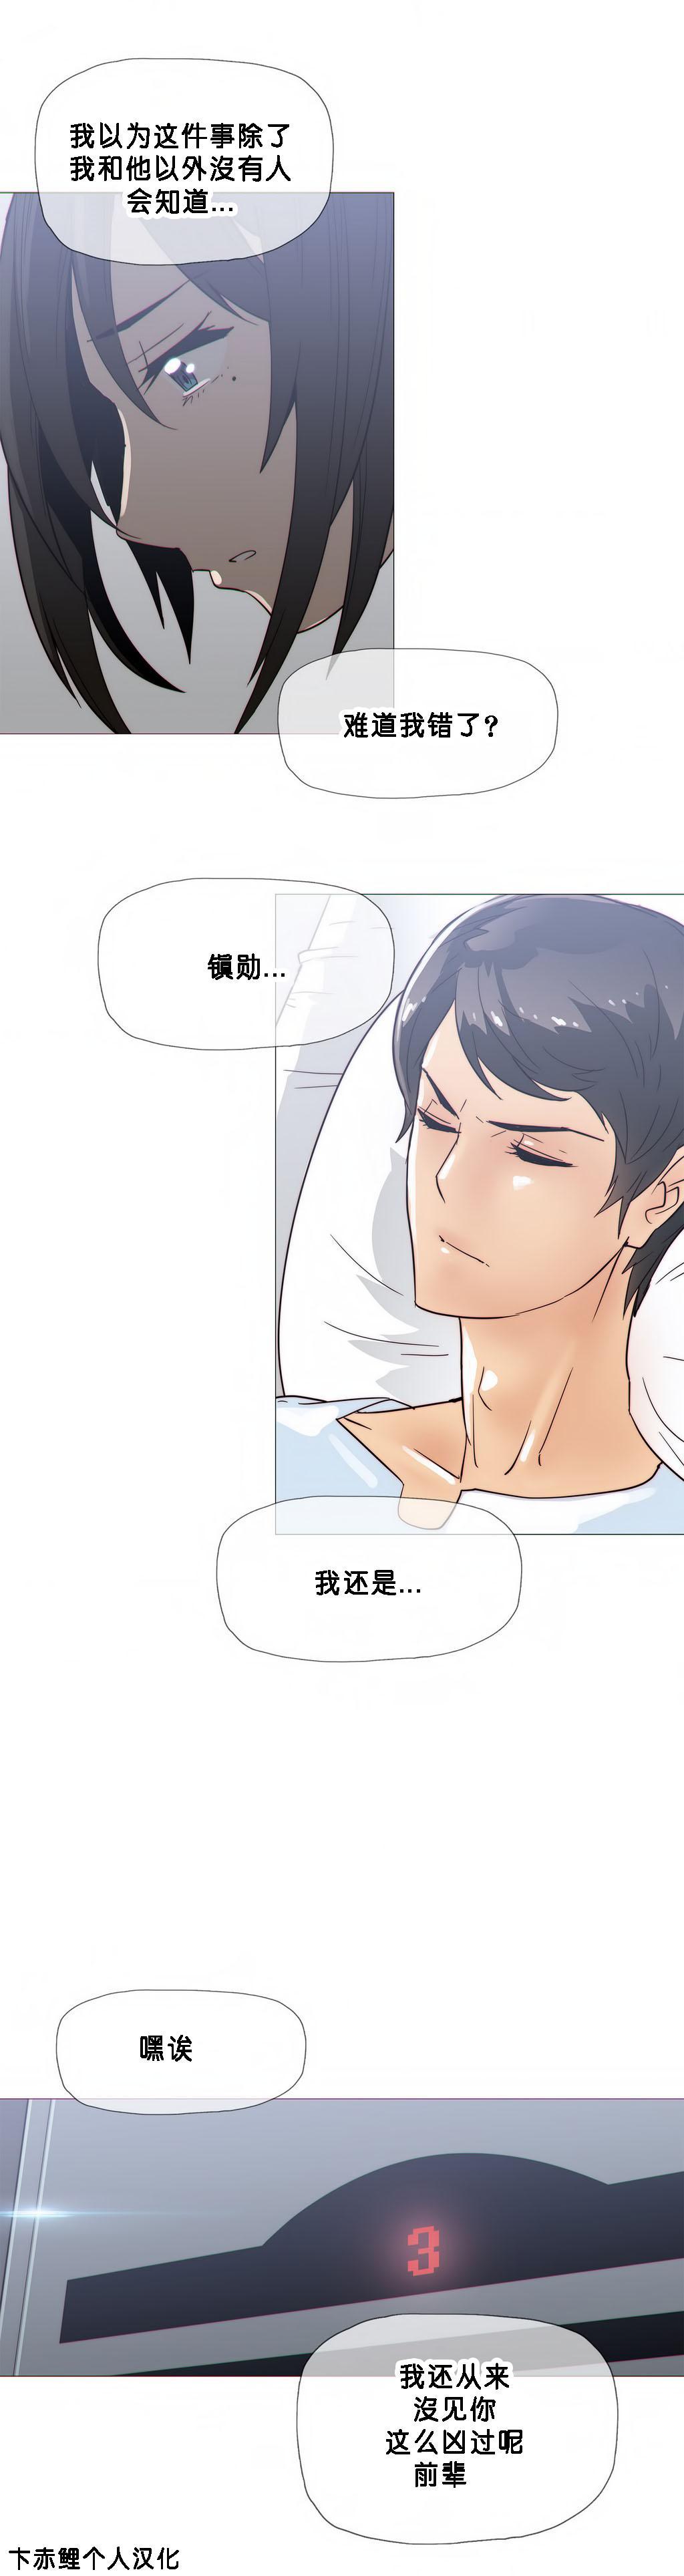 HouseHold Affairs 【卞赤鲤个人汉化】1~21话(持续更新中) 462